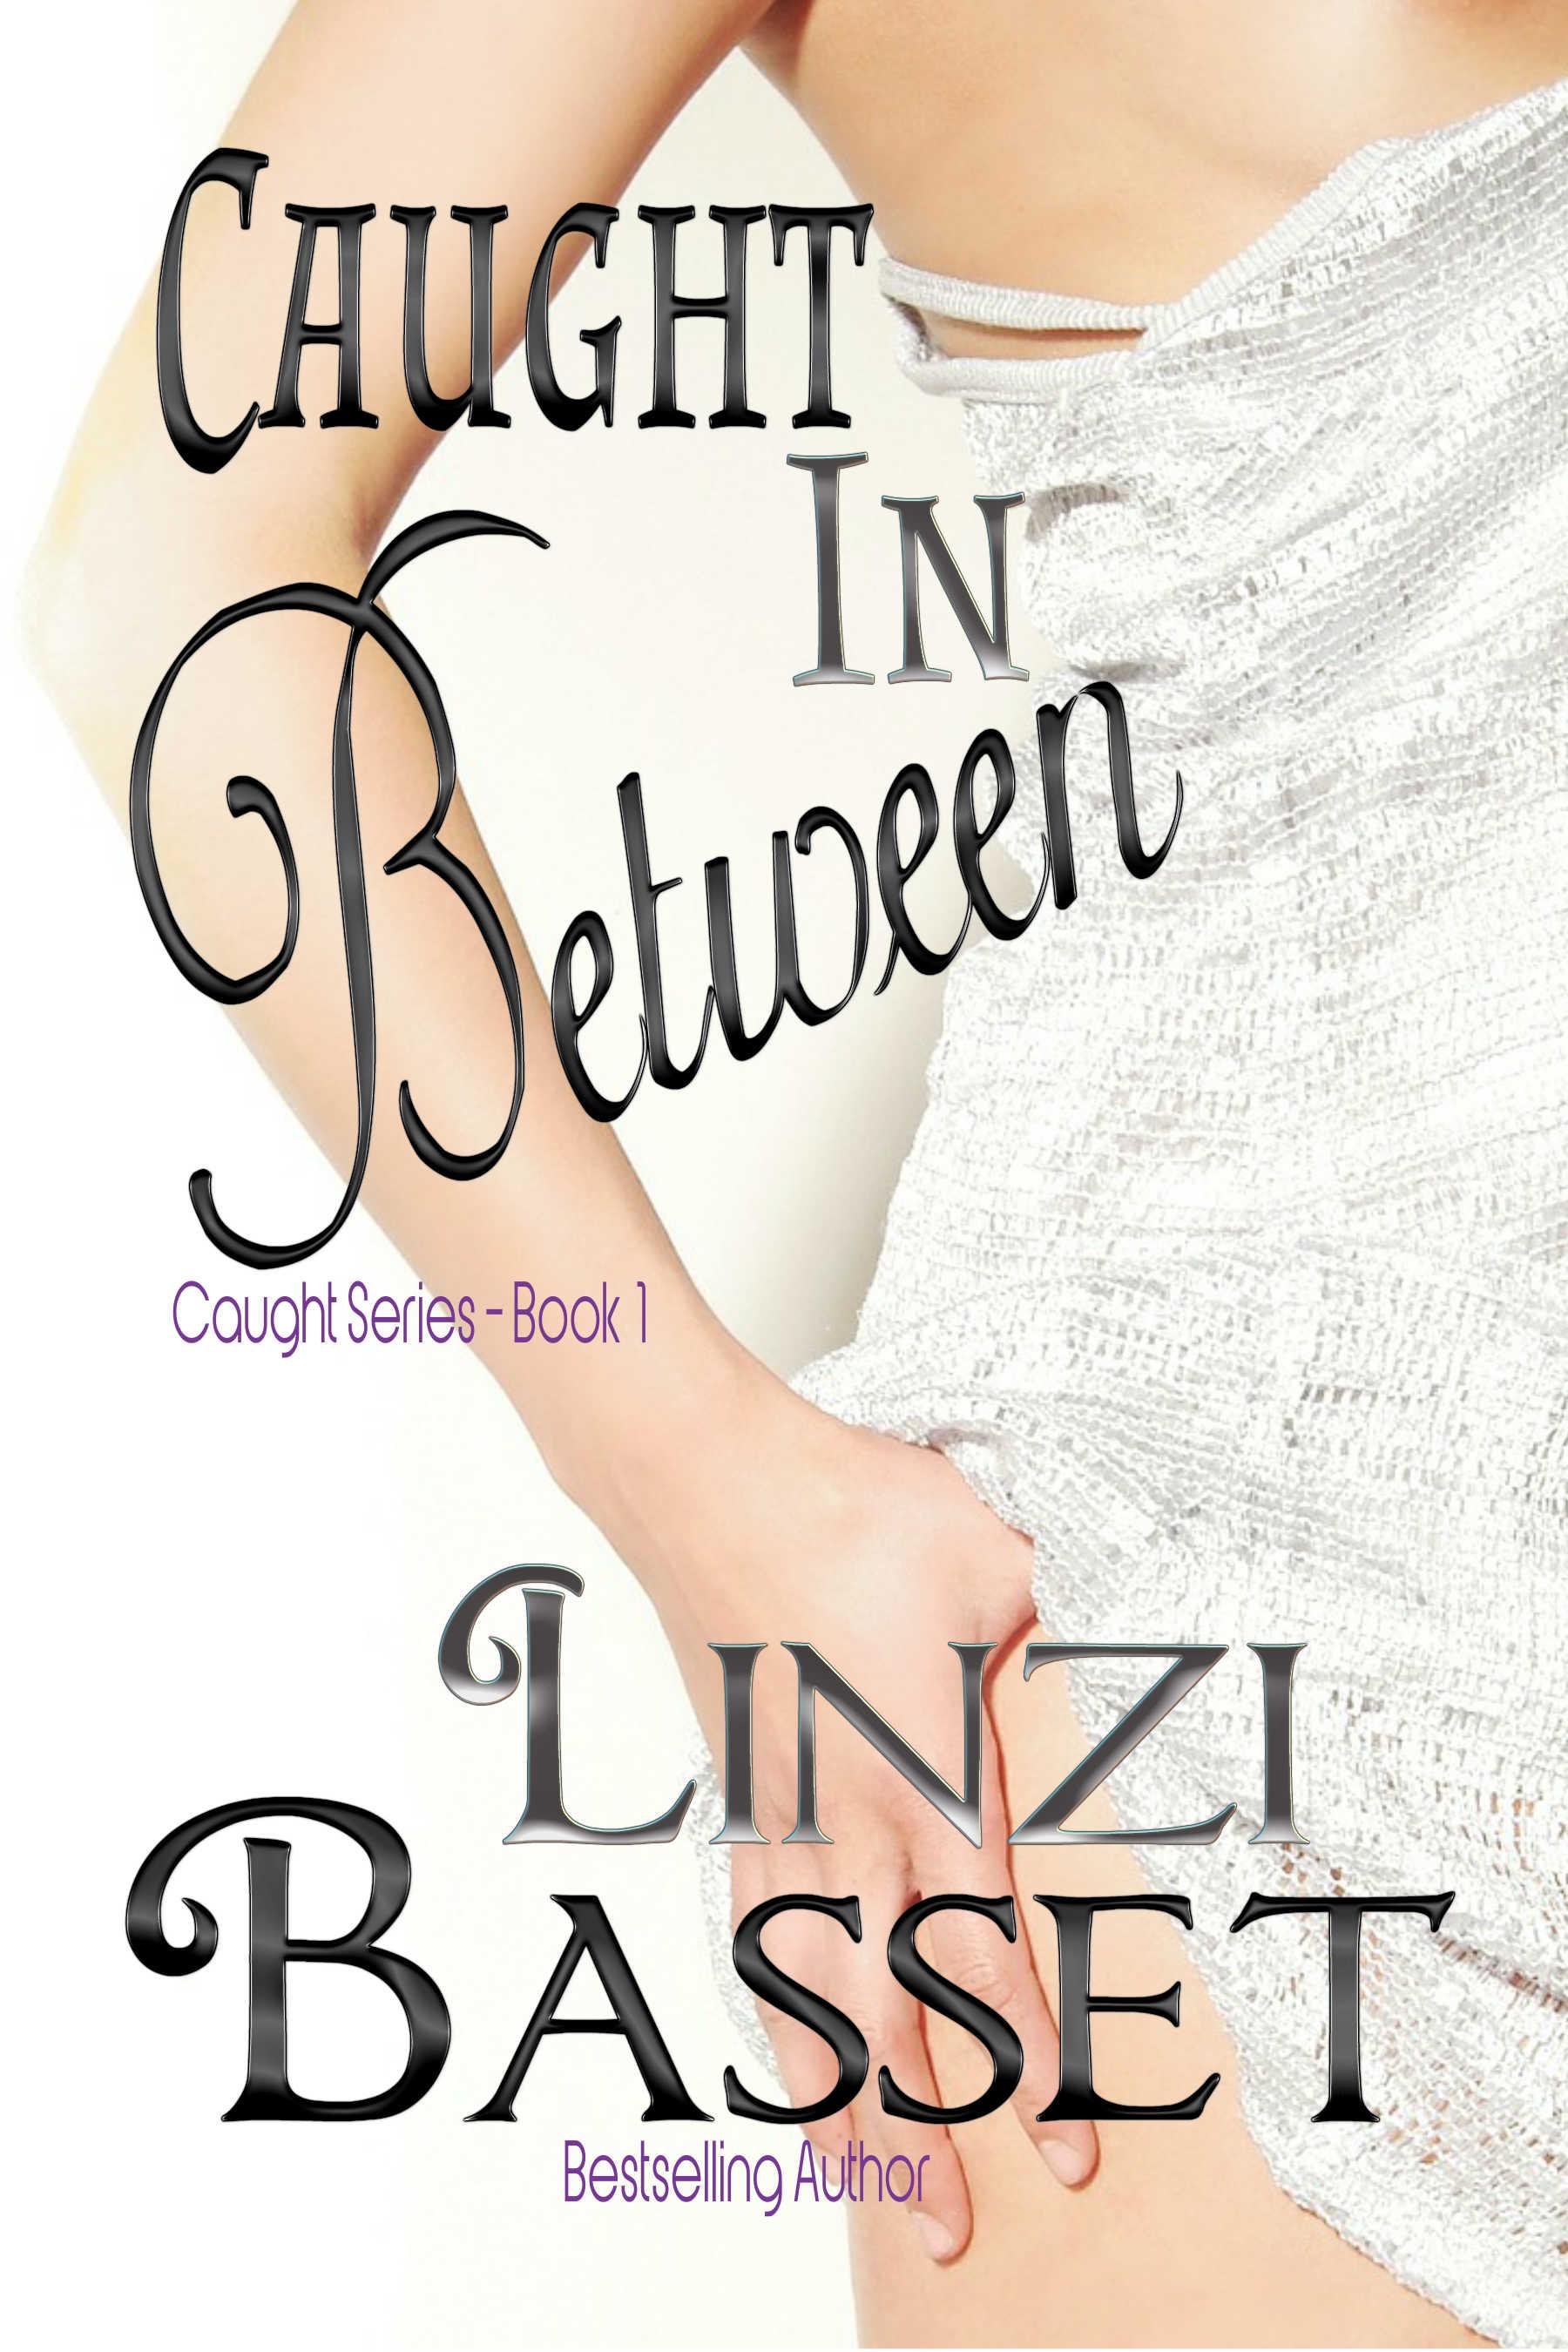 Caught In Between, an Ebook by Linzi Basset